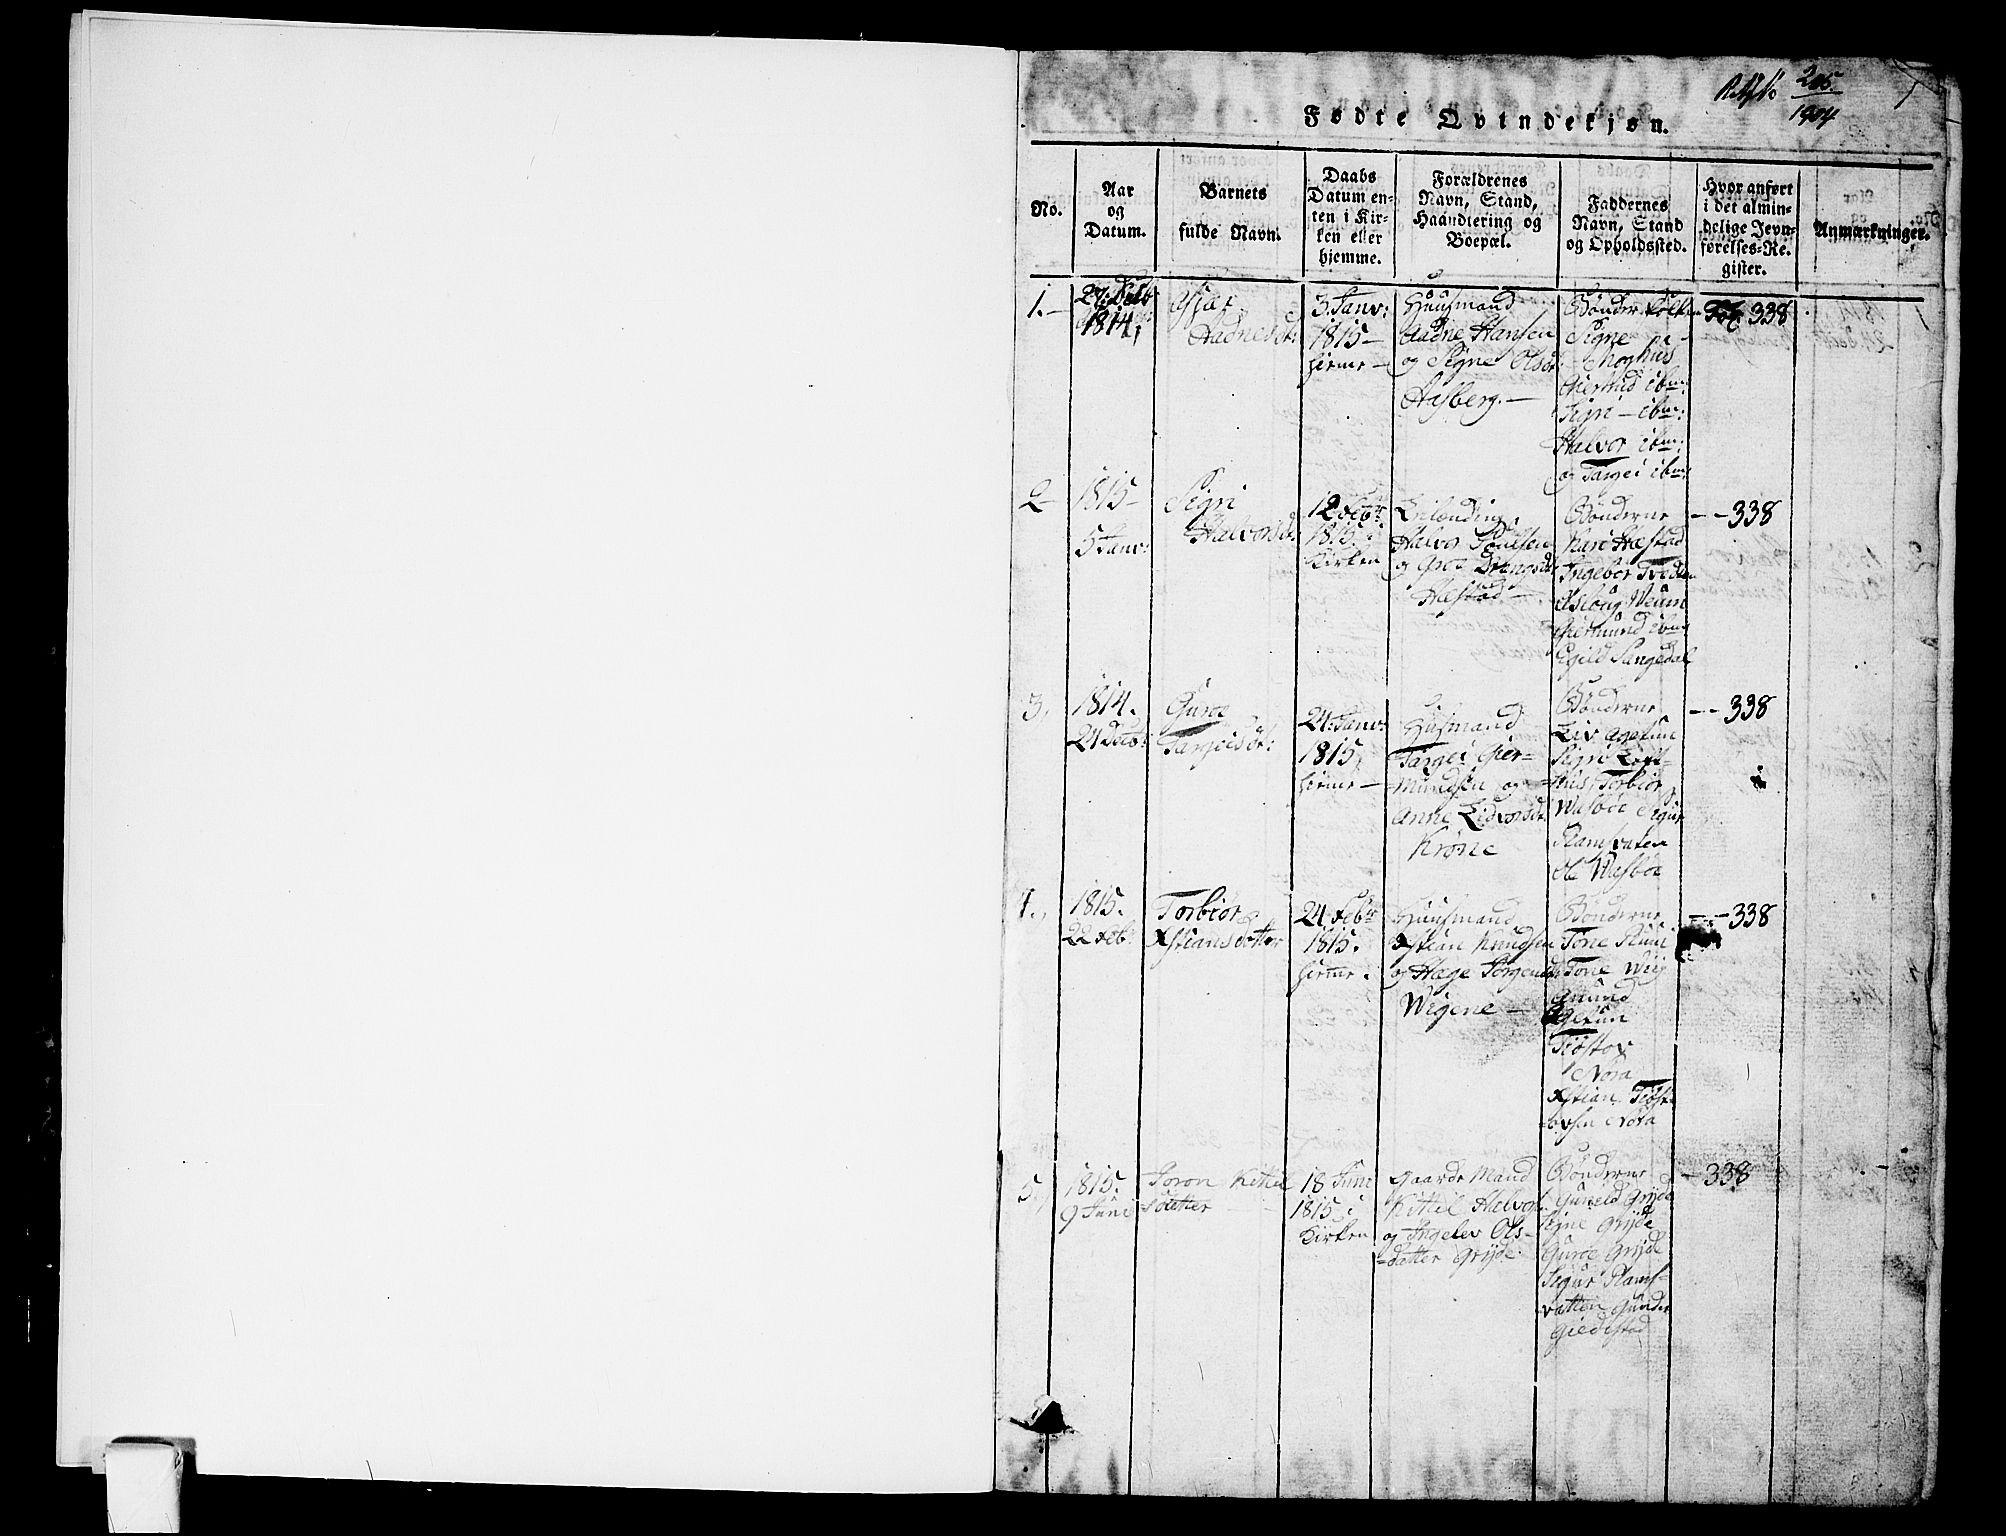 SAKO, Fyresdal kirkebøker, G/Ga/L0001: Parish register (copy) no. I 1, 1816-1840, p. 1